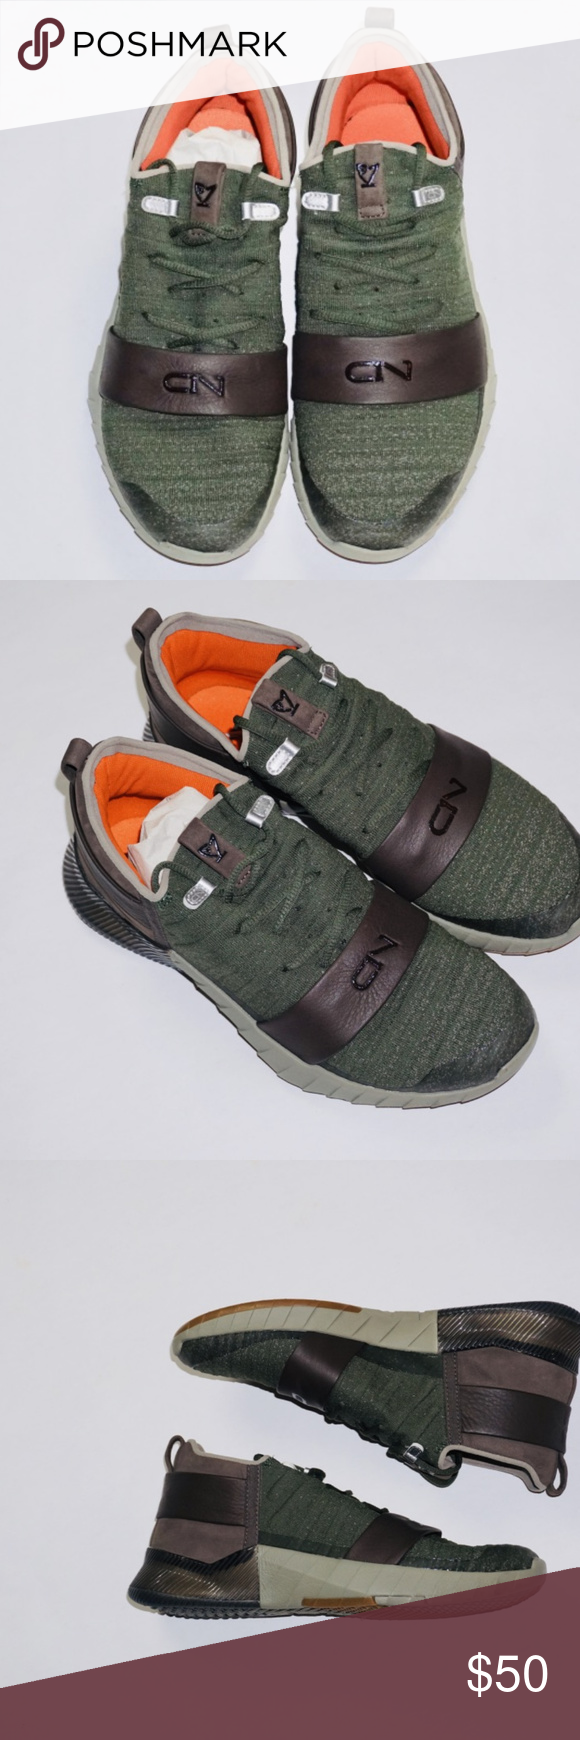 Under Armour Kids Boys C1N TR LUX Sneaker